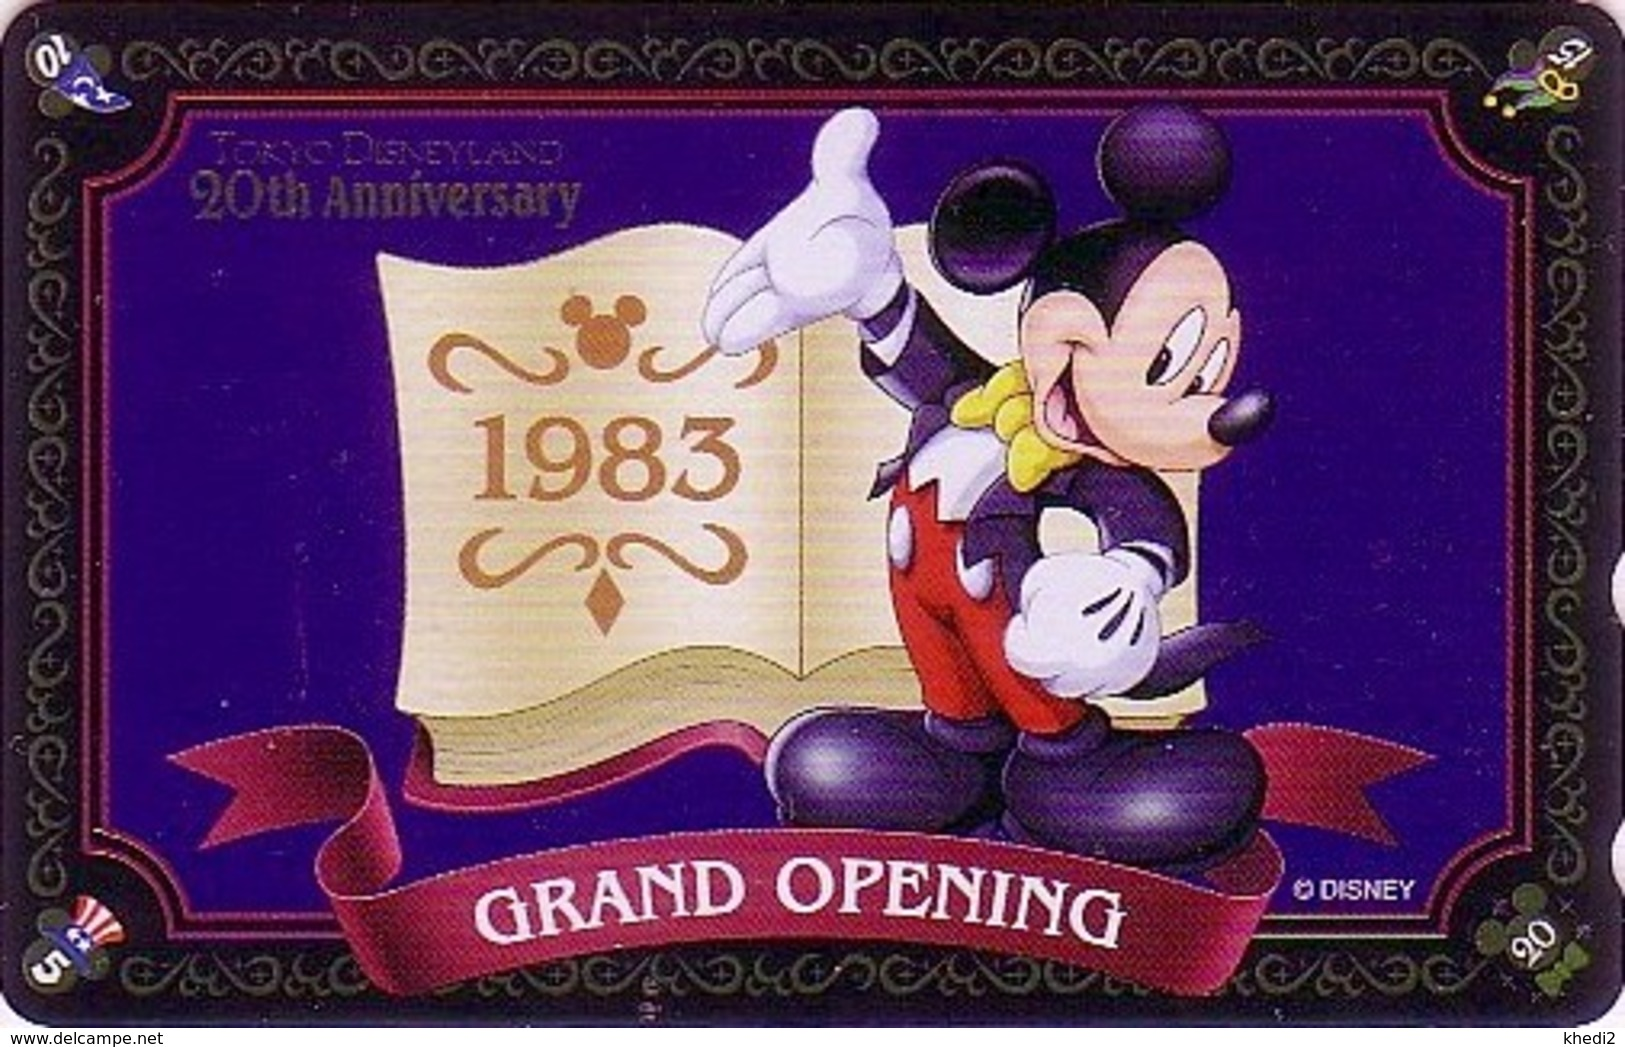 Télécarte Brillante NEUVE Japon / MF-1001662 - DISNEY DISNEYLAND - MICKEY * GRAND OPENING 1983 * - Japan MINT Phonecard - Disney